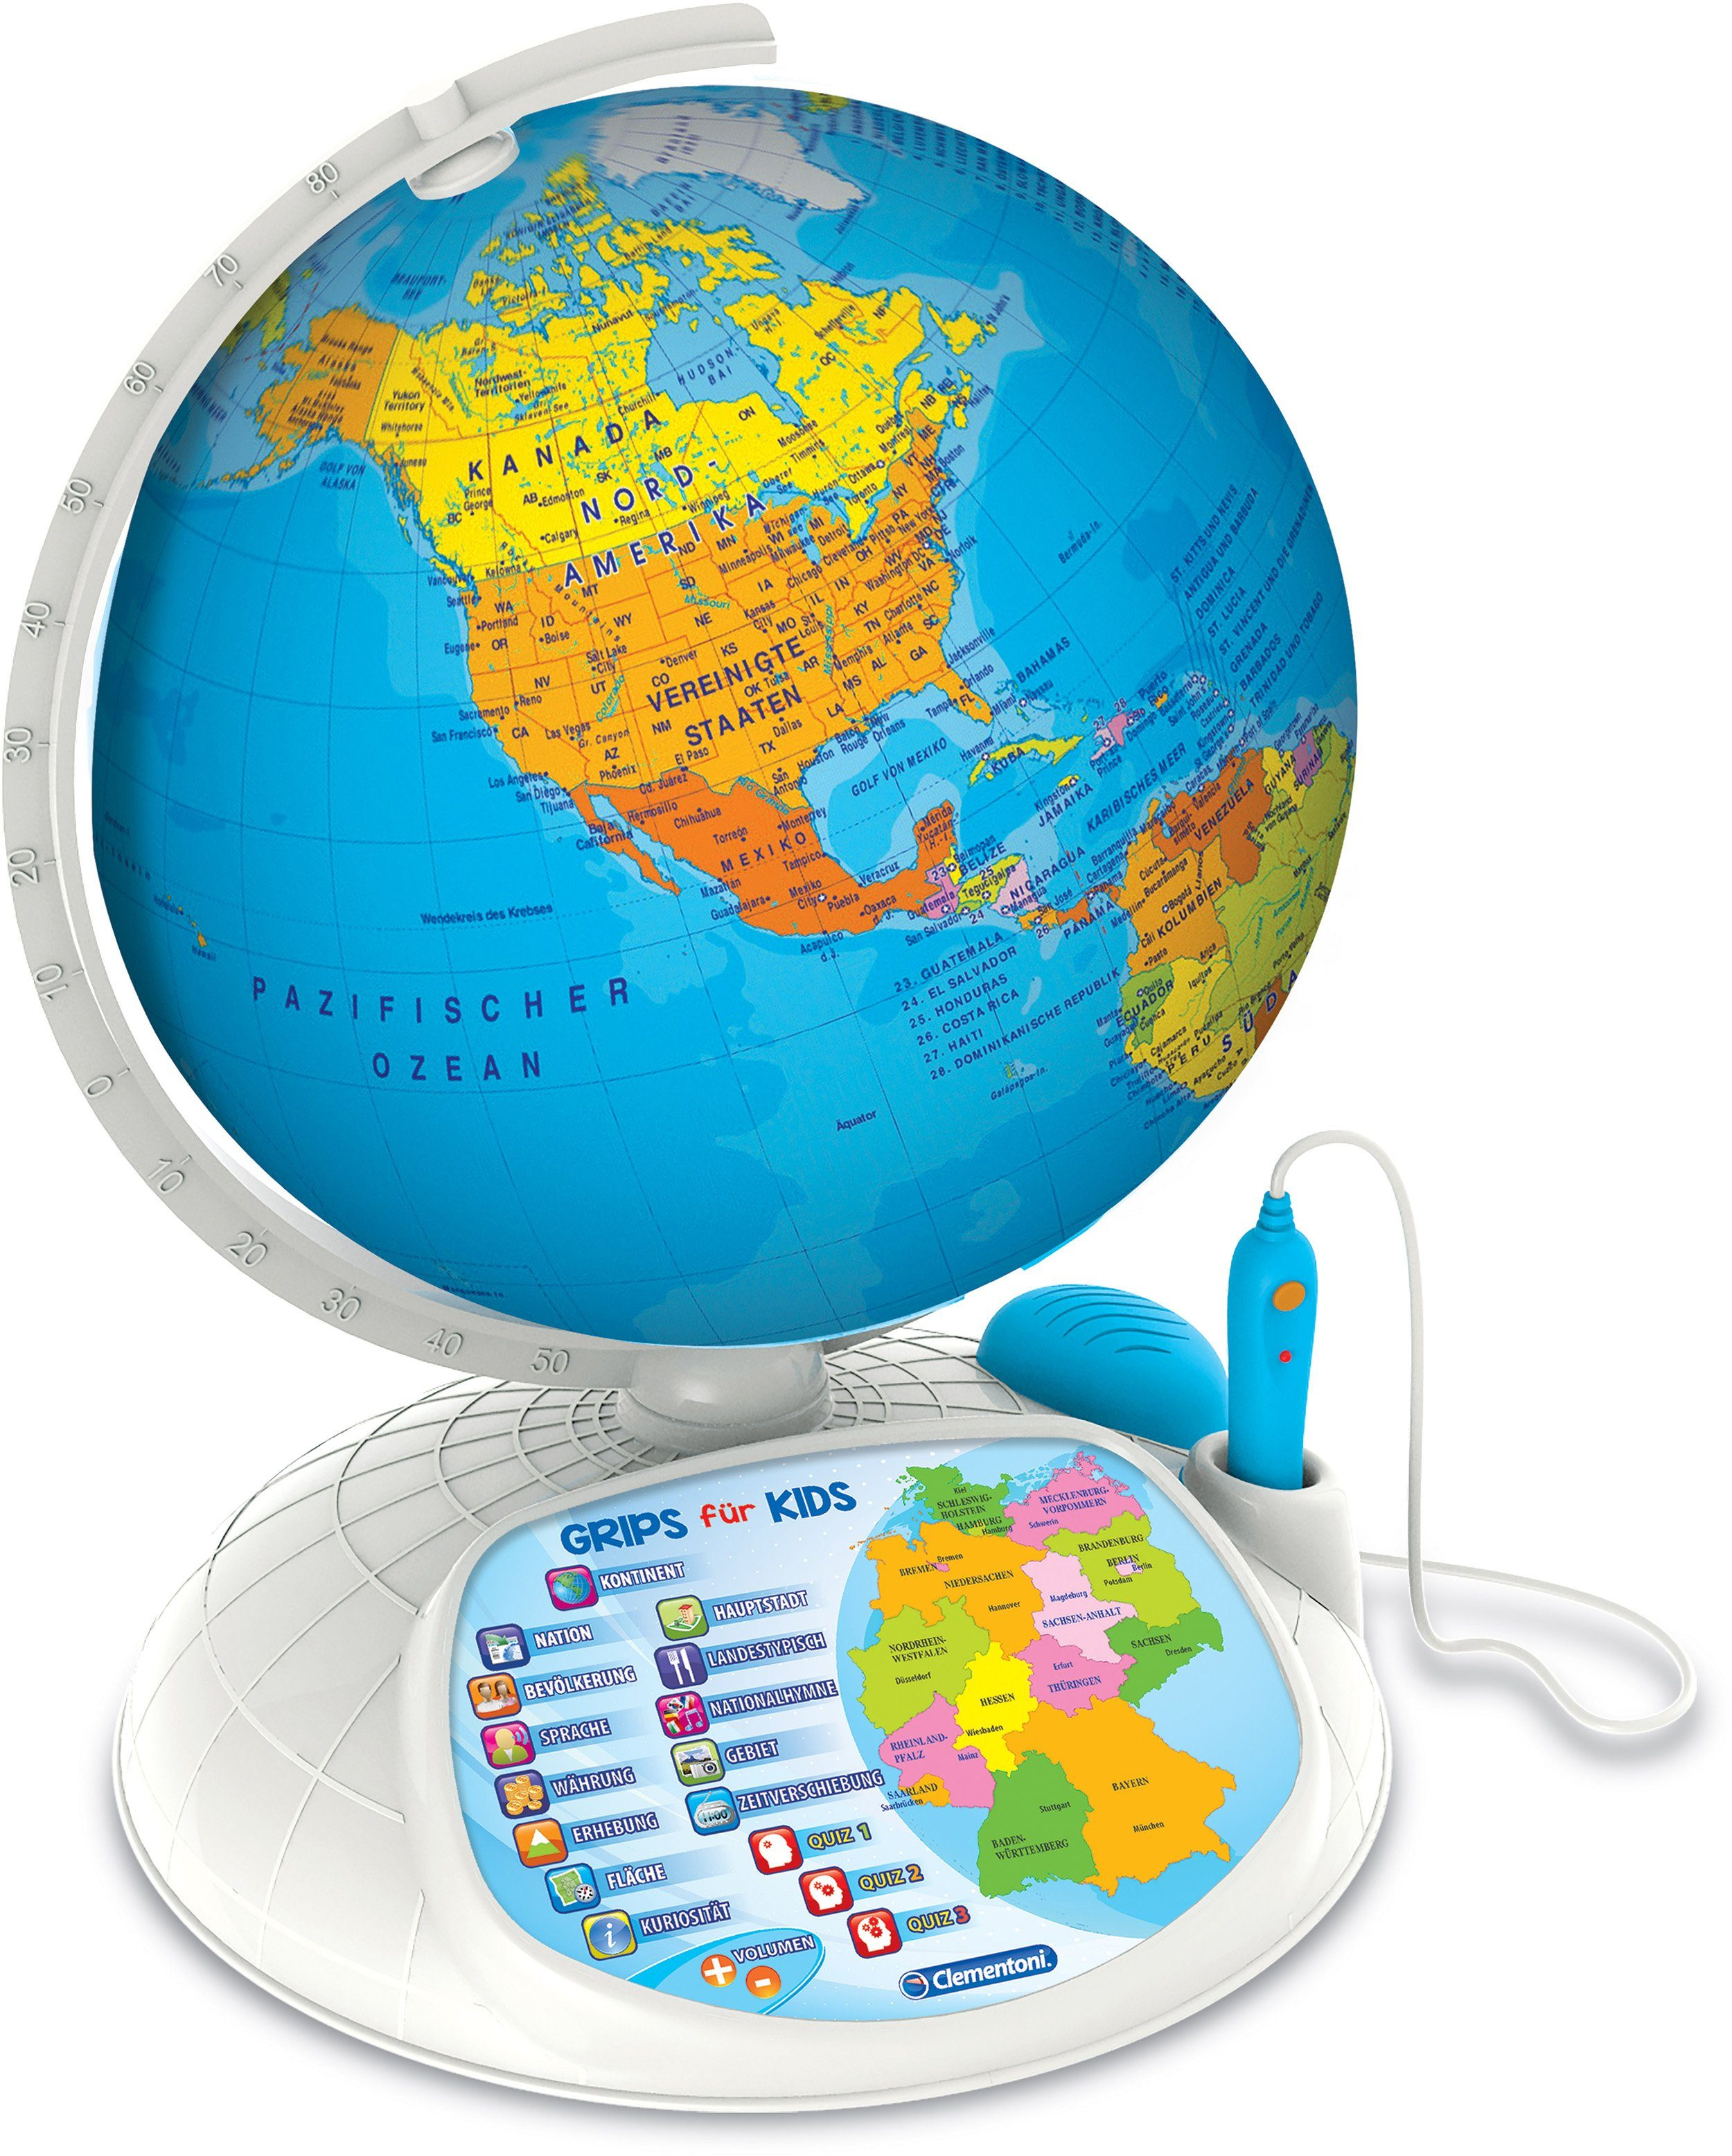 Clementoni Lernspiel, »Interaktiver Globus mit App«